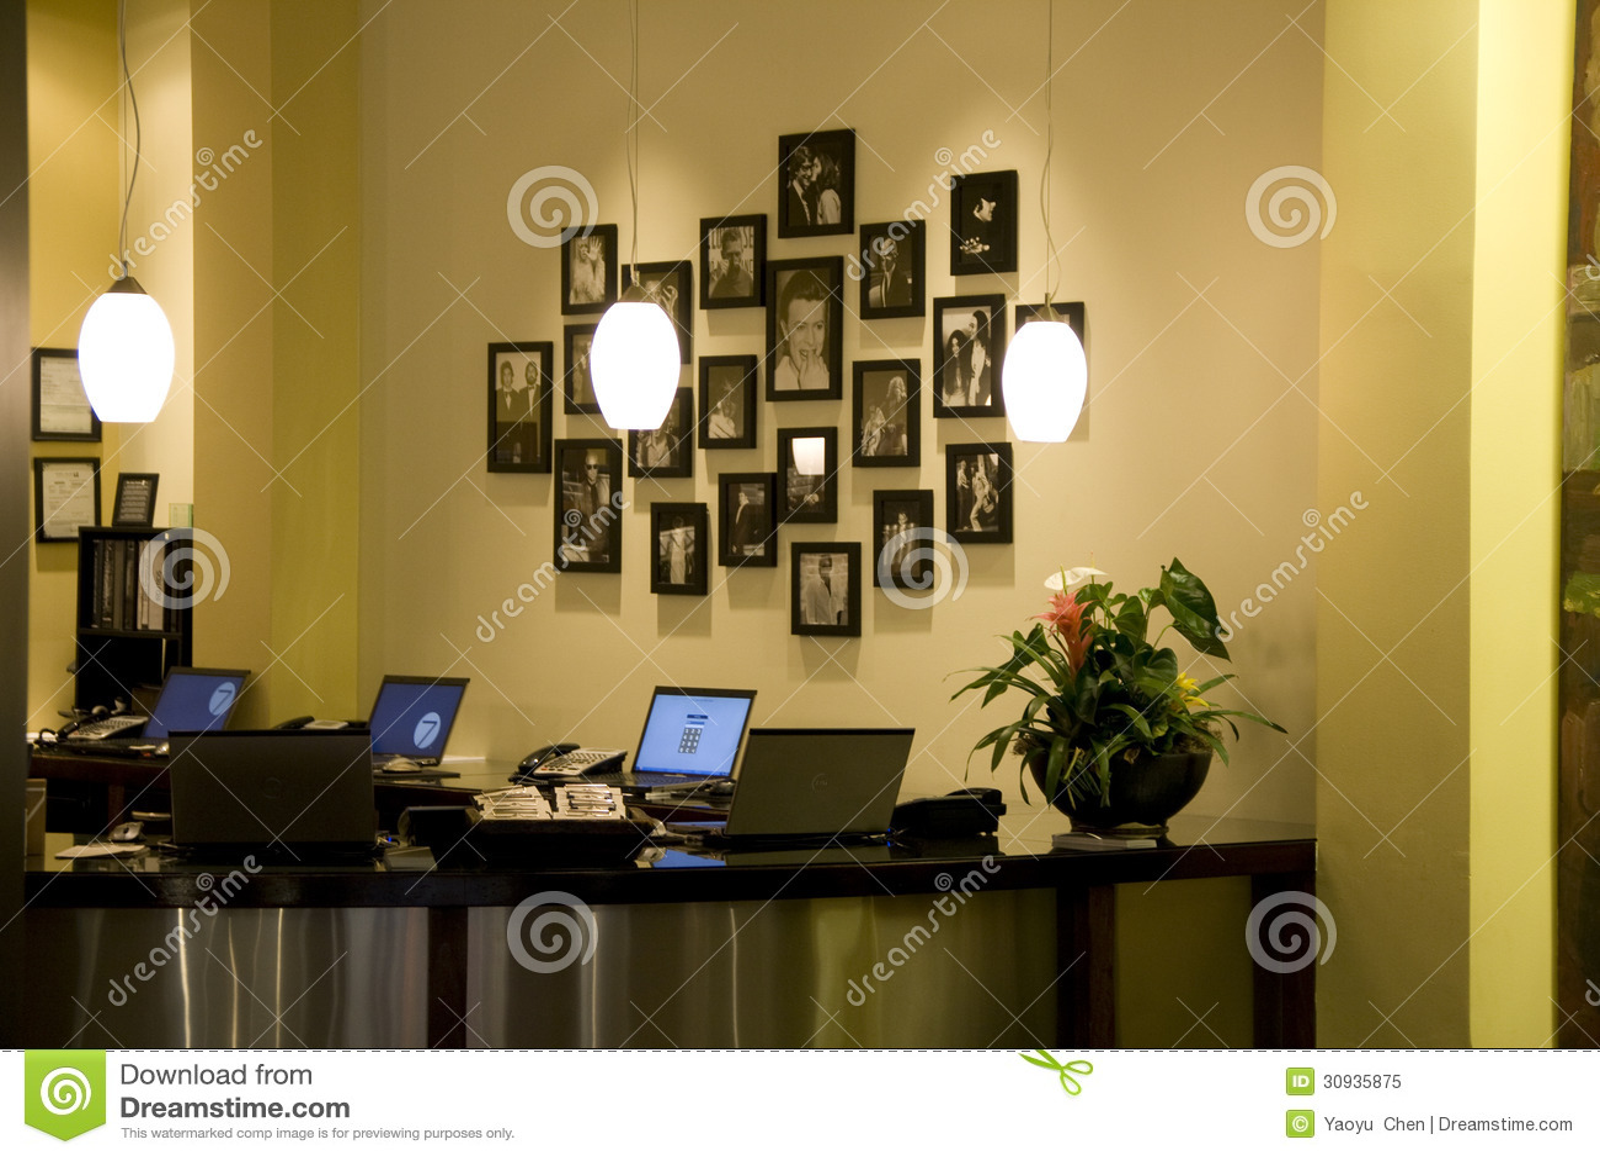 Front desk office editorial image image 30935875 for 7 salon bellevue square